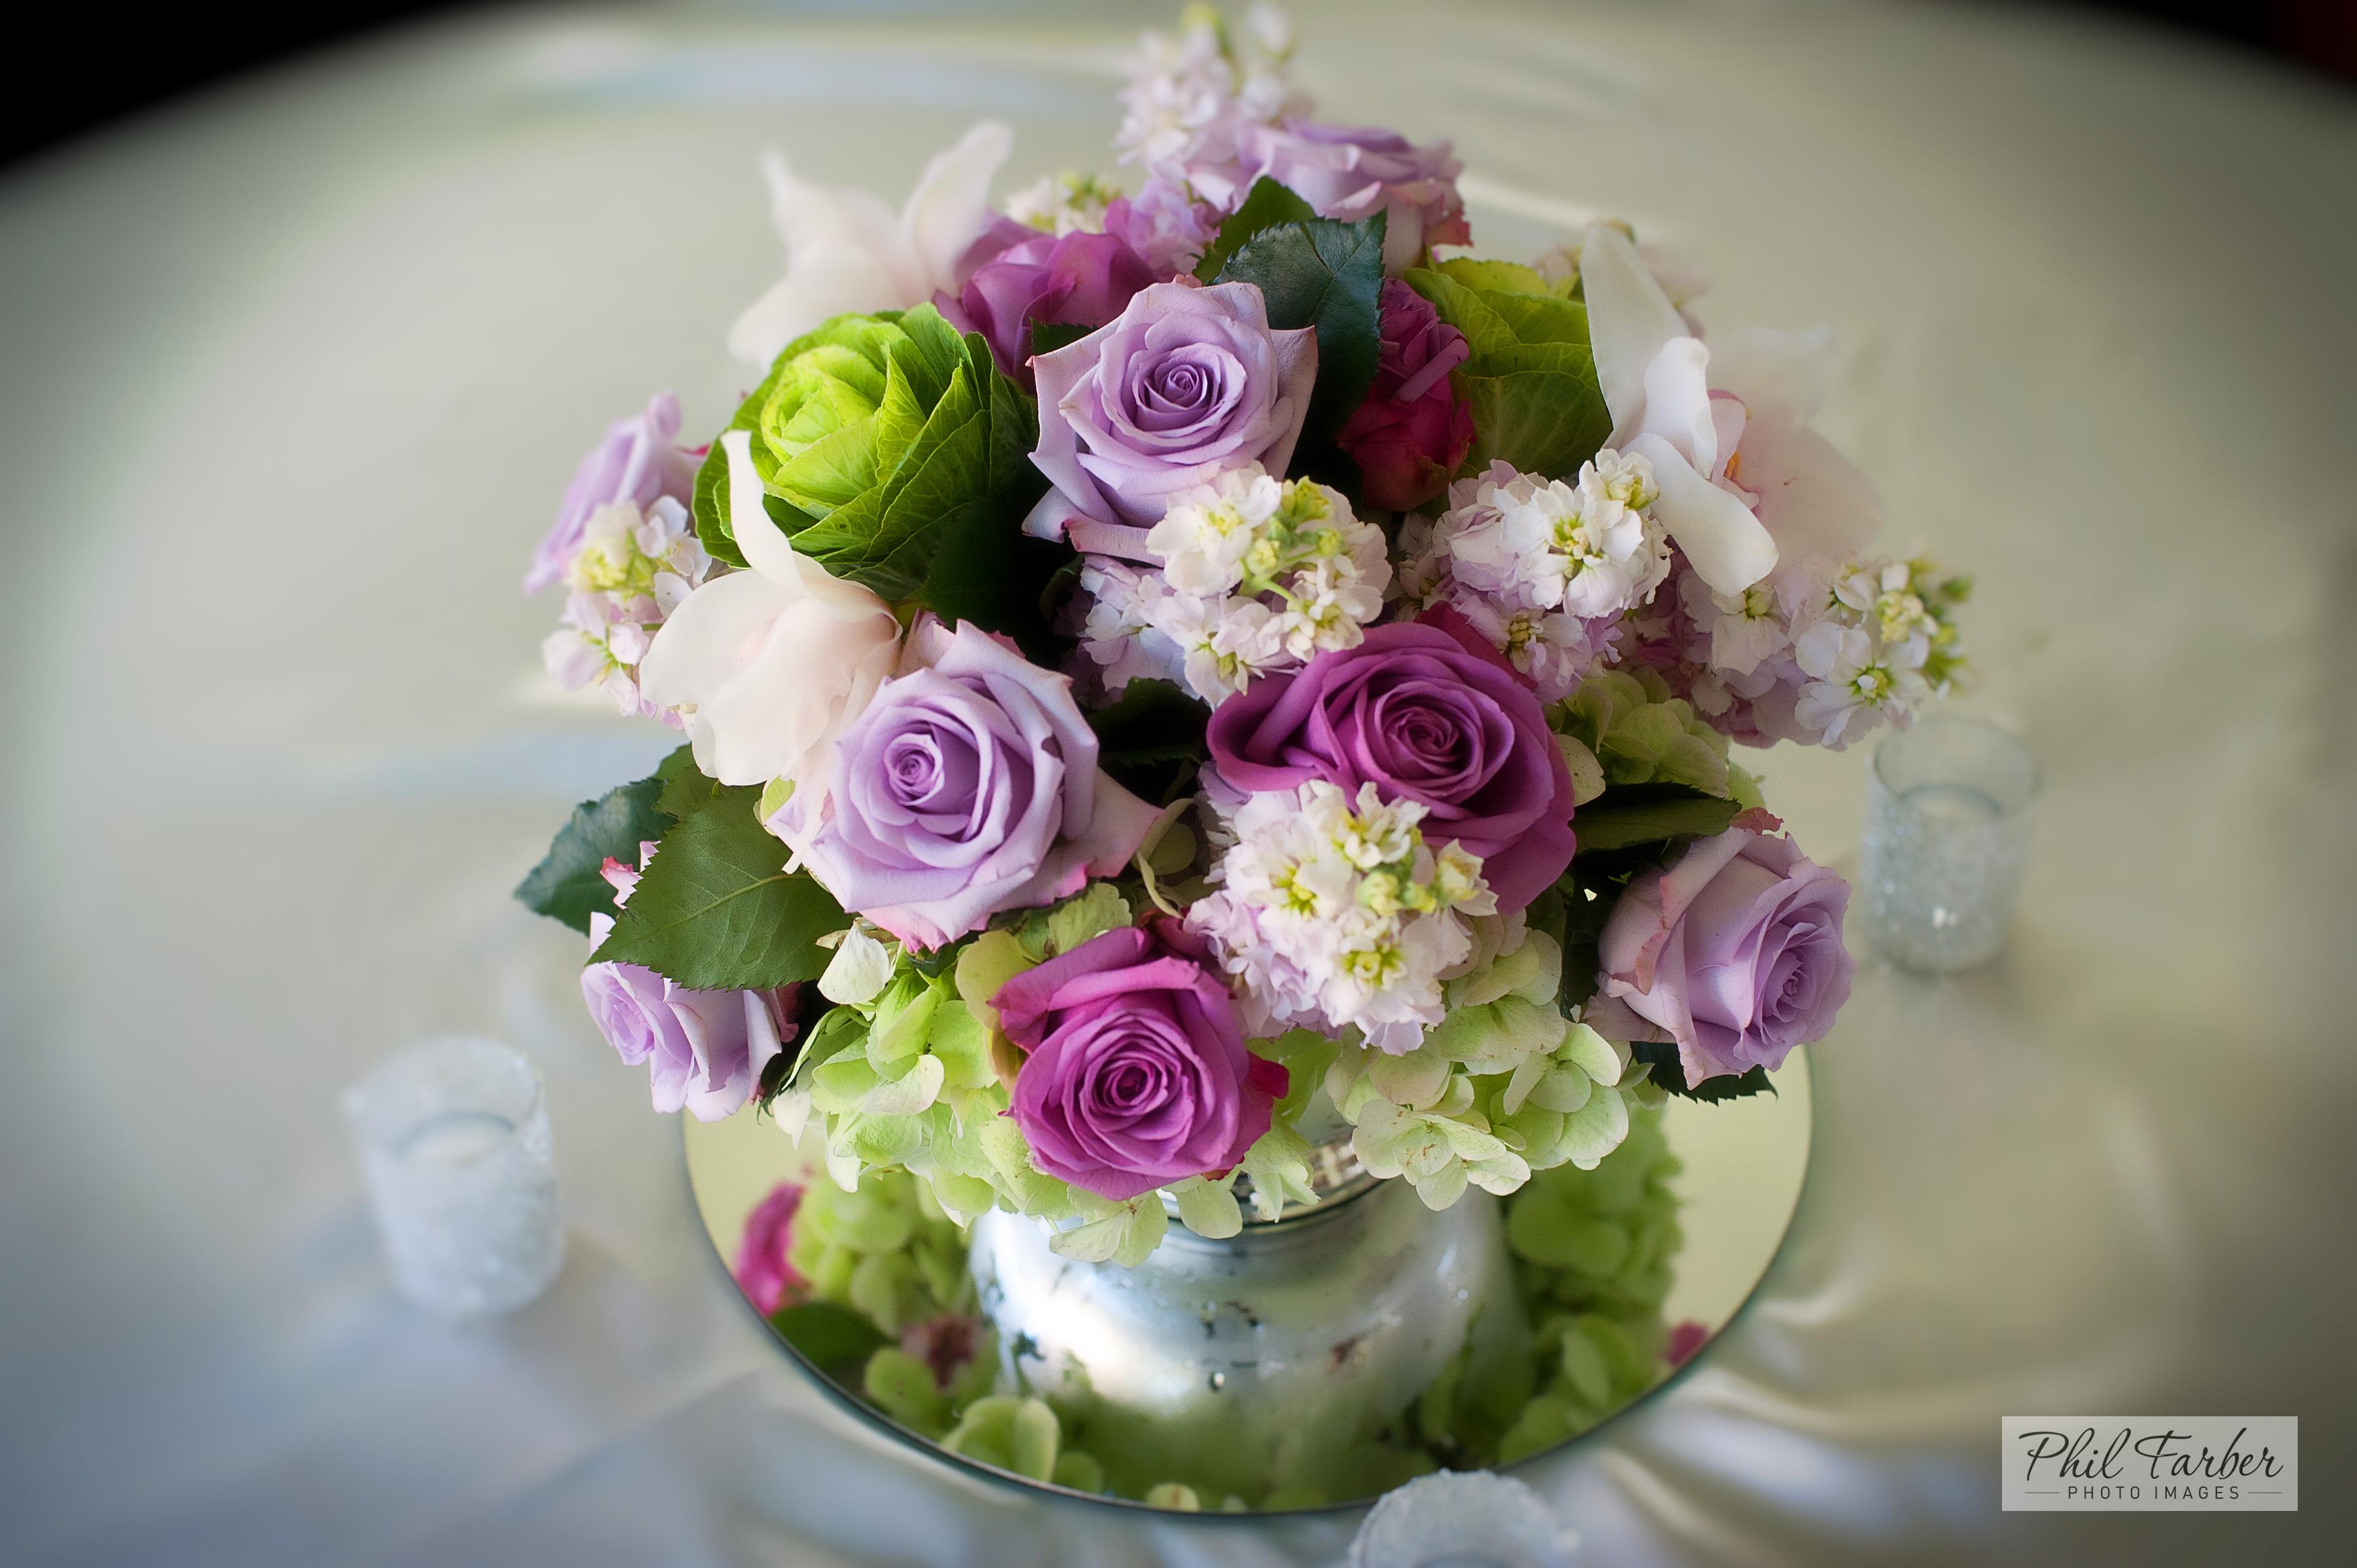 roses, hydrangea & more